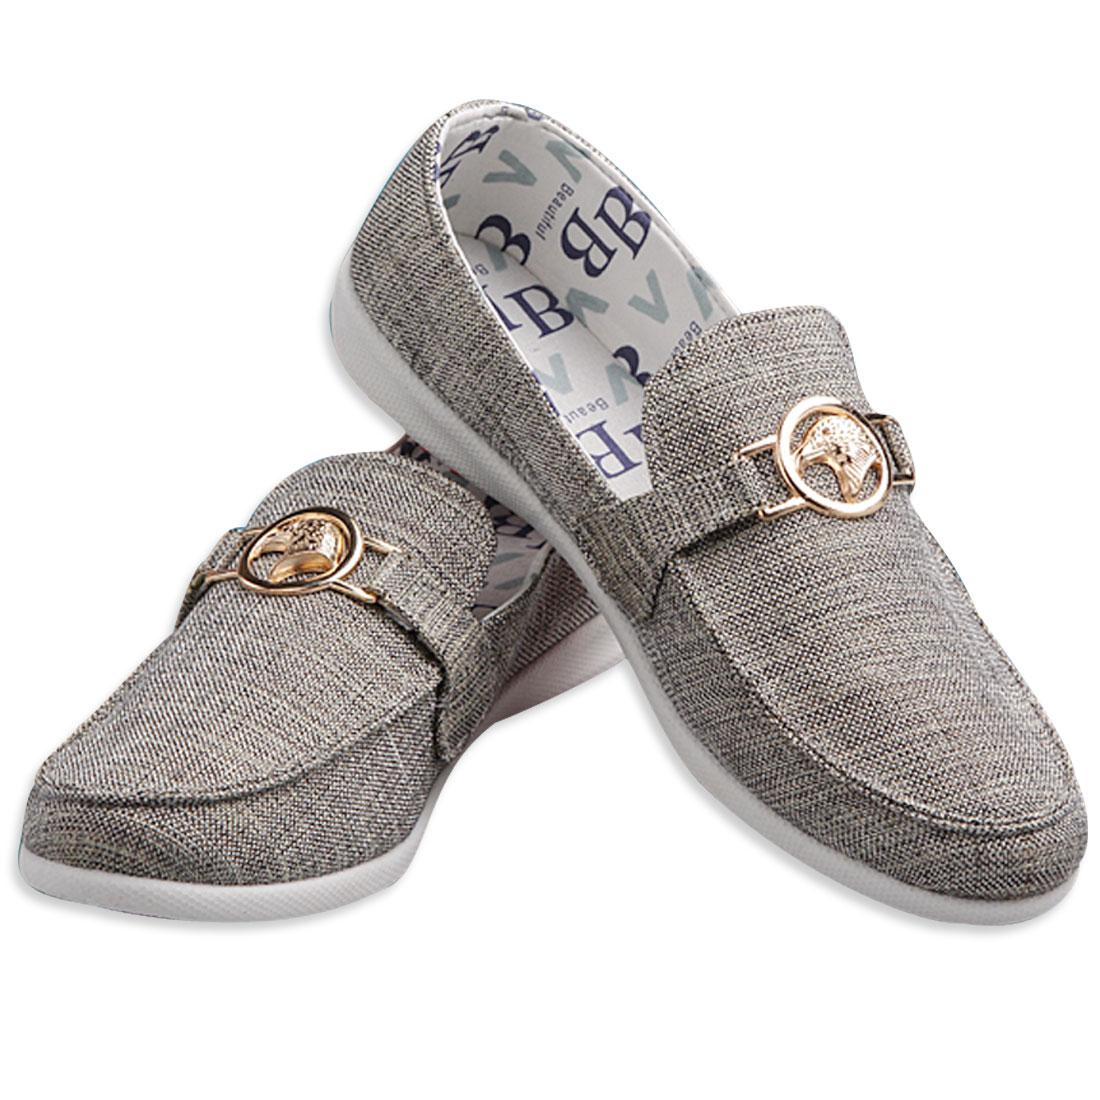 Men Soft Footbed Canvas Shoes w Eagle Logo Decor Gray Silver Tone US Size 11